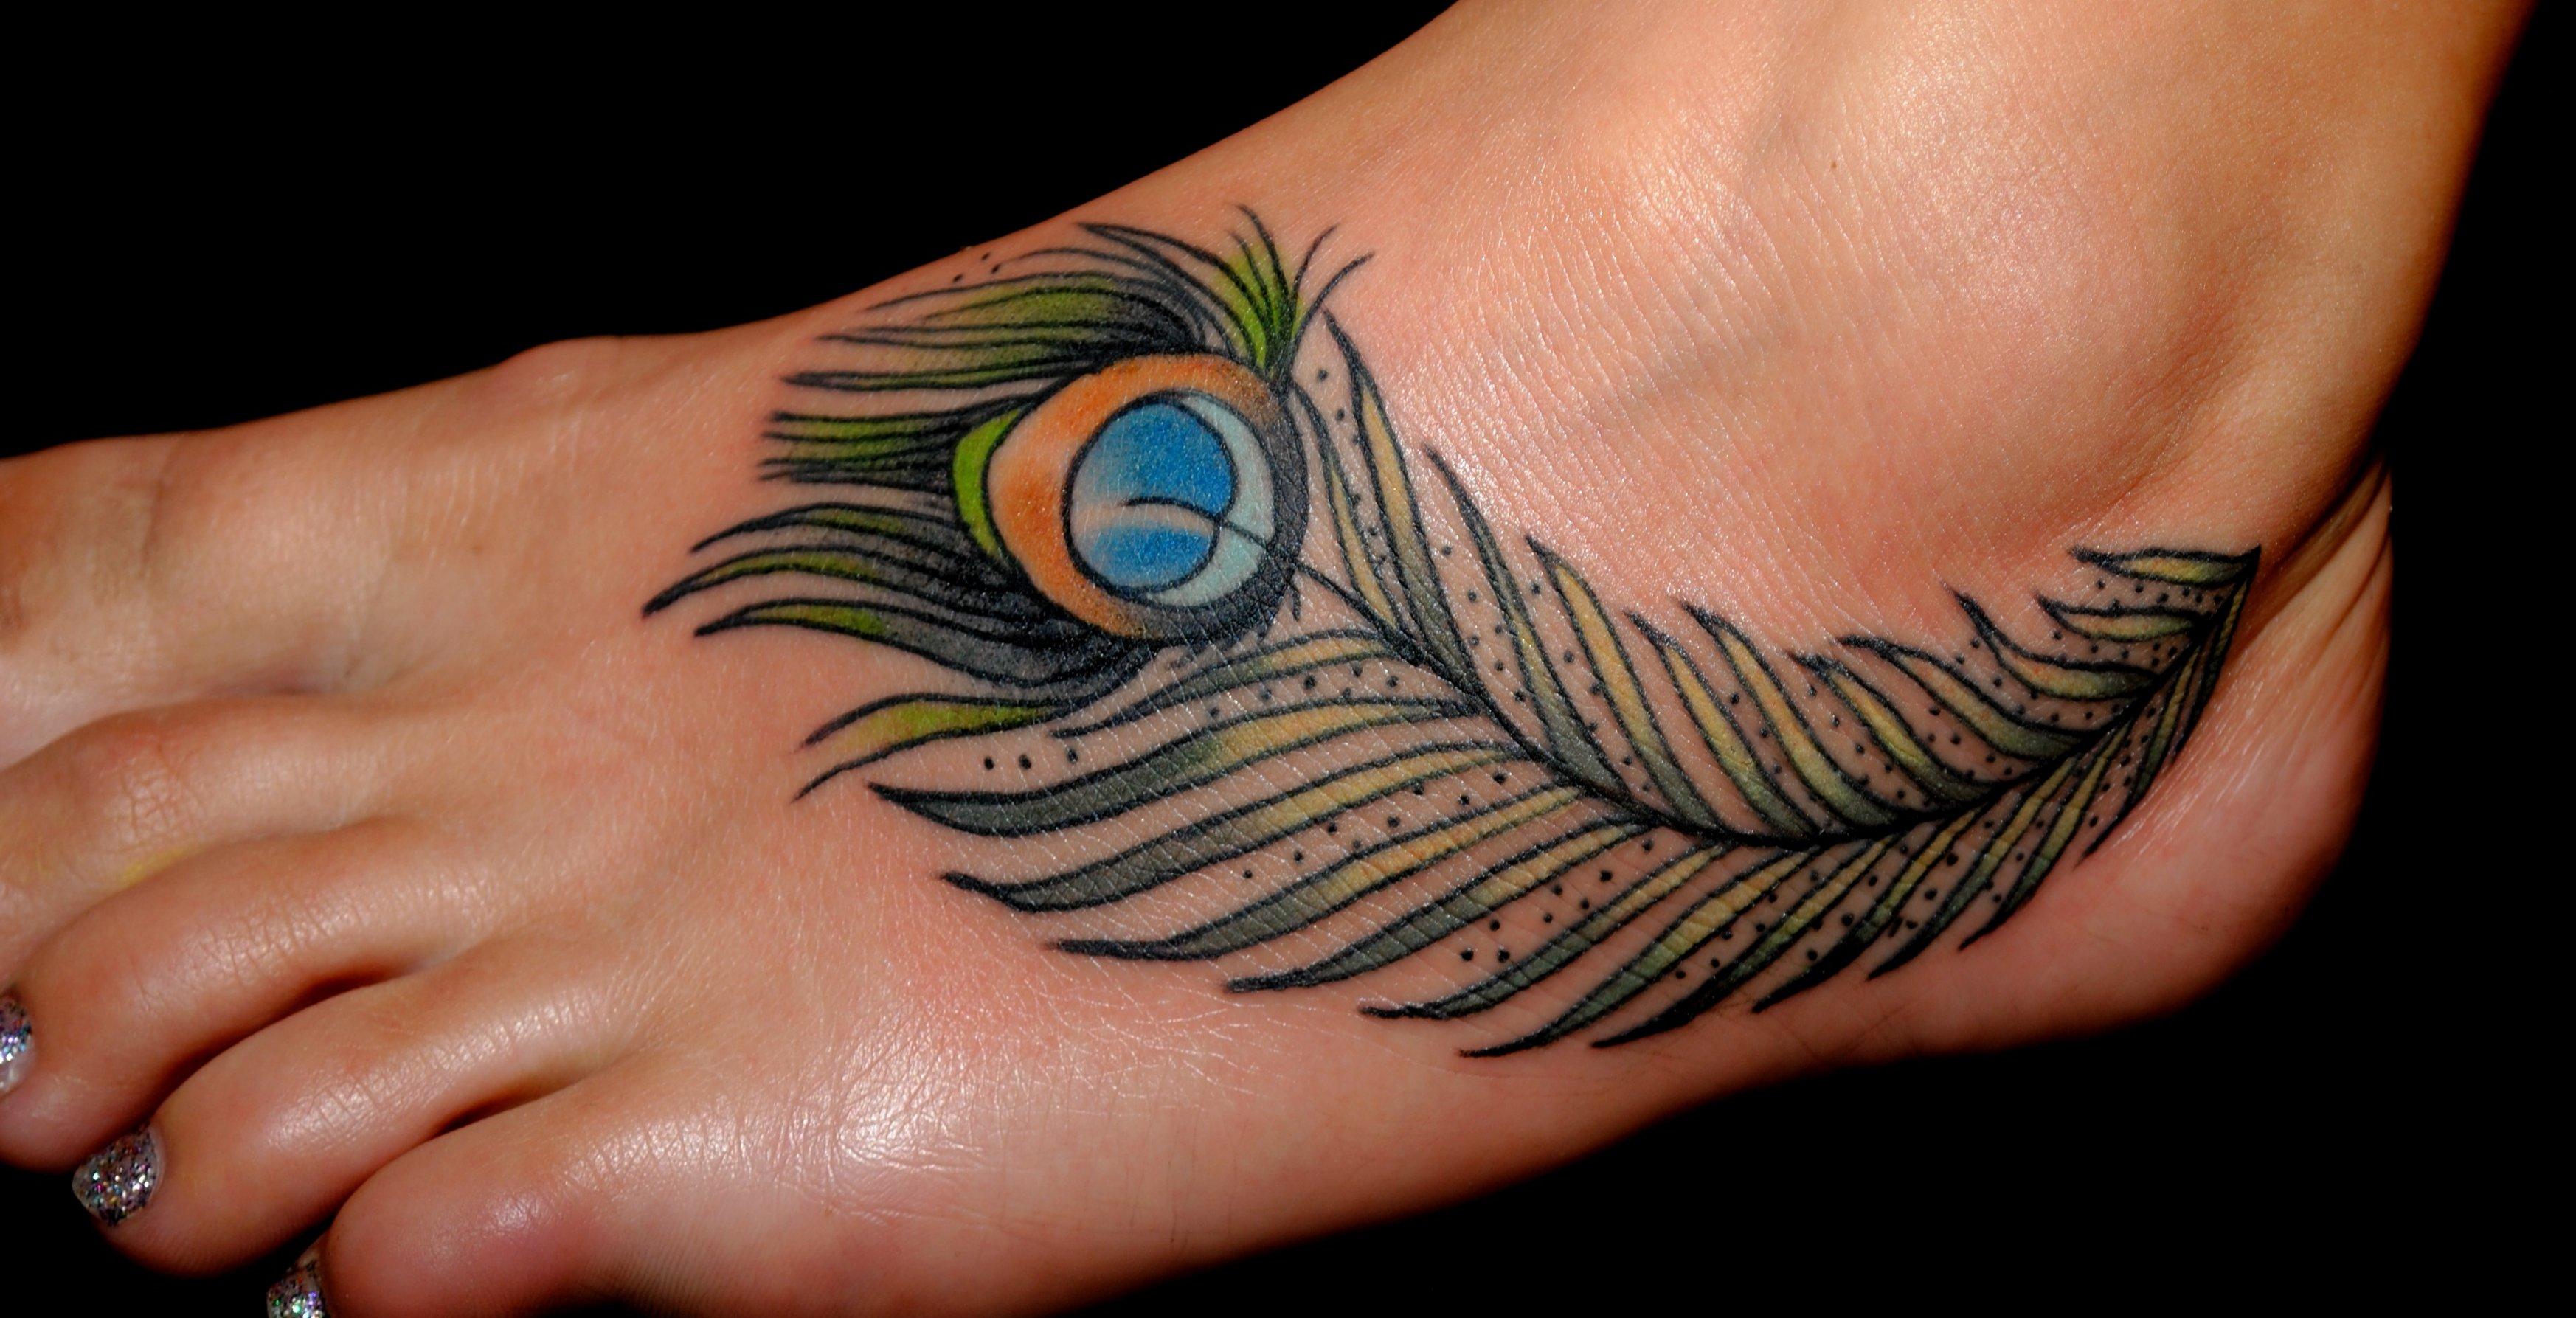 Pfau Tattoo Motive und Pfauenfeder Tattoo Bedeutung